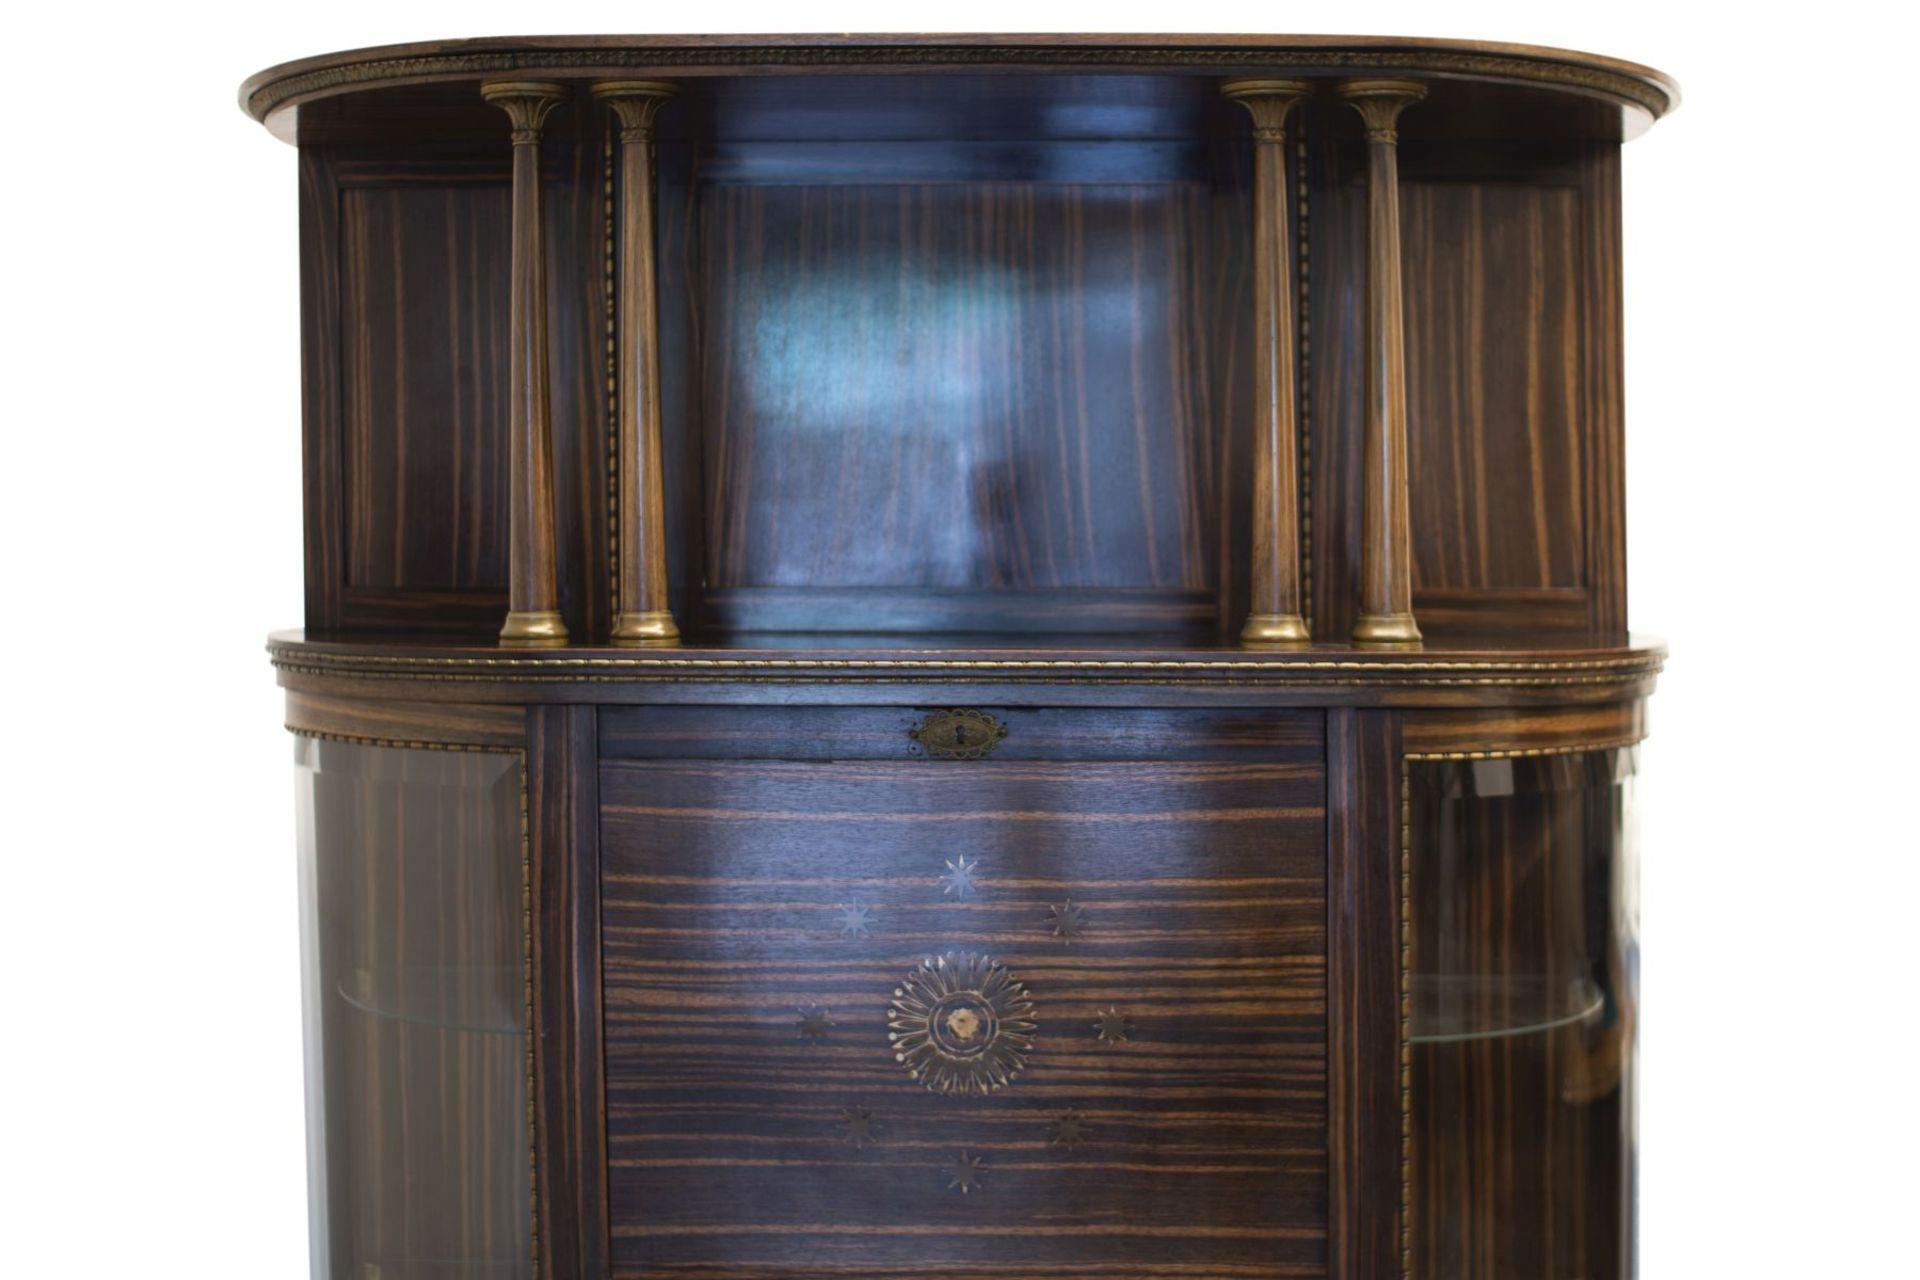 Antique englisch secretary - Image 2 of 5